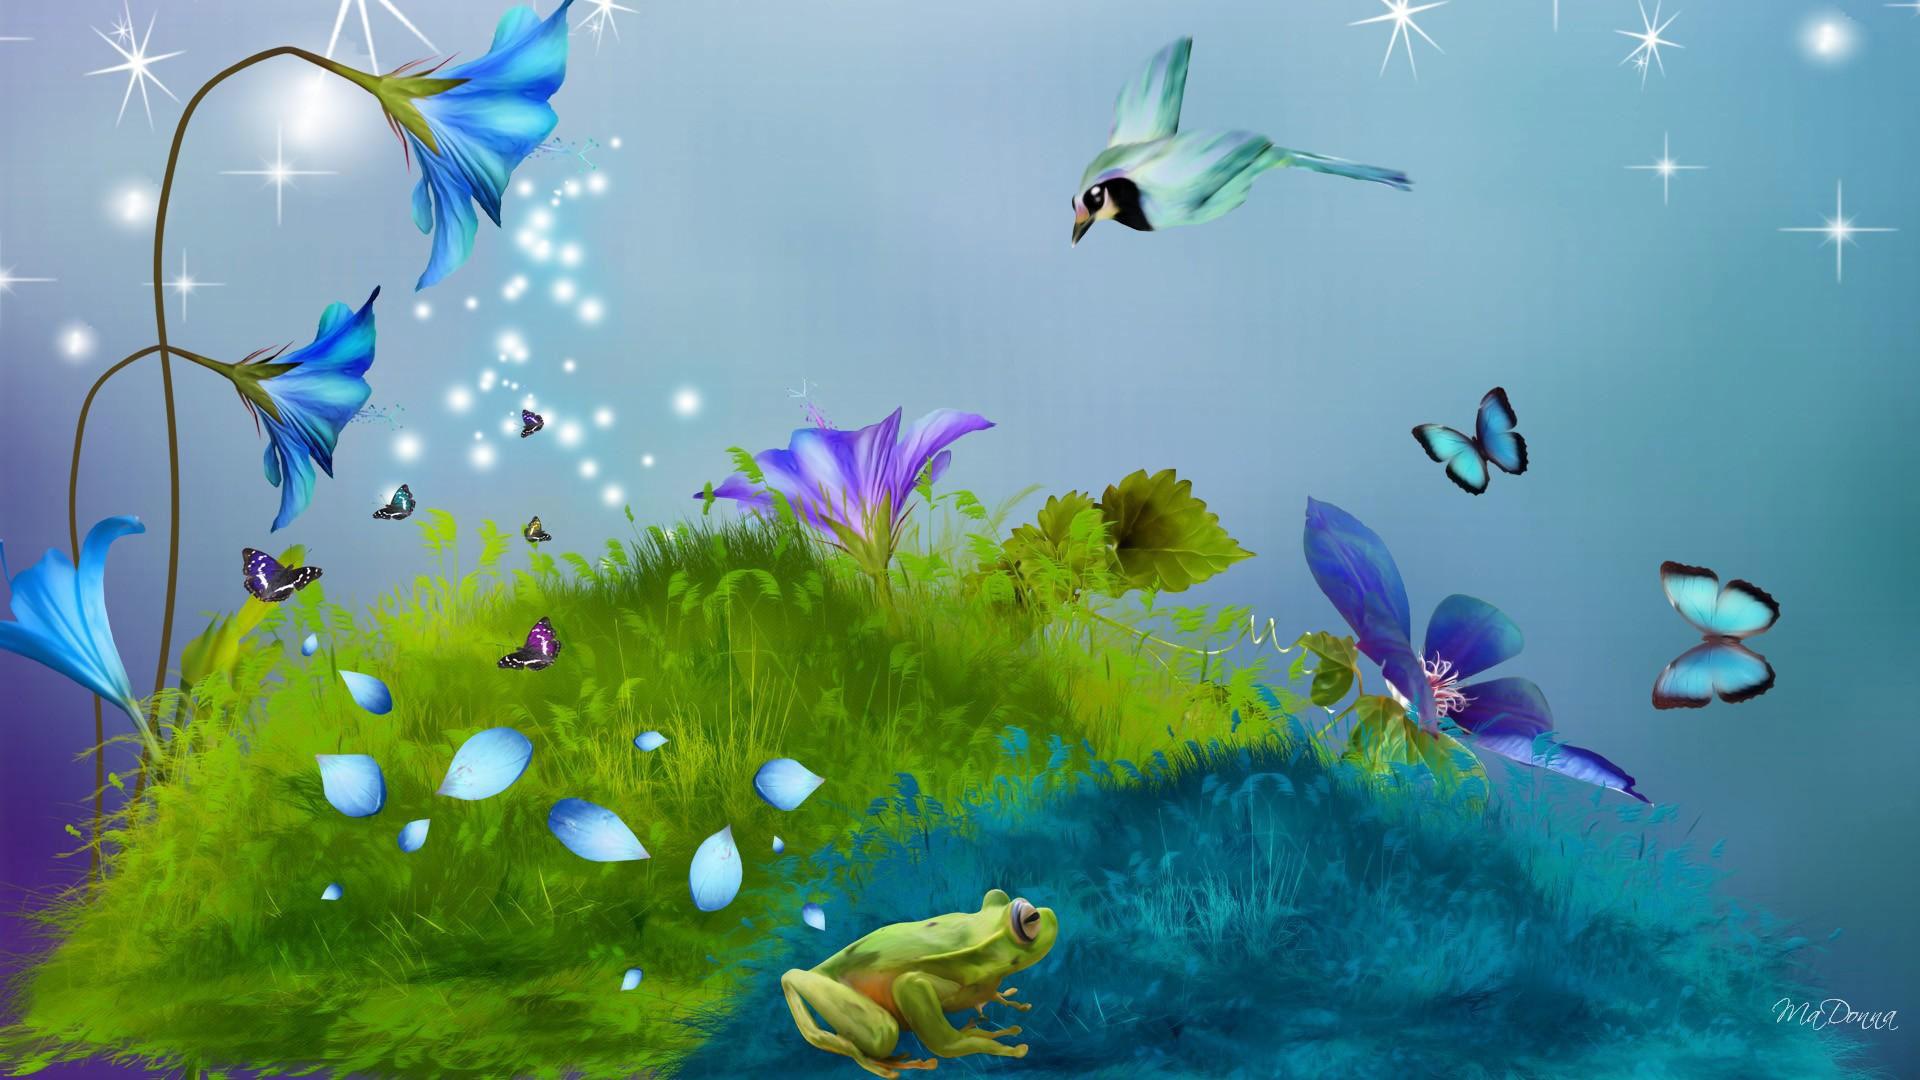 hd pics photos flowers animated natural desktop background wallpaper